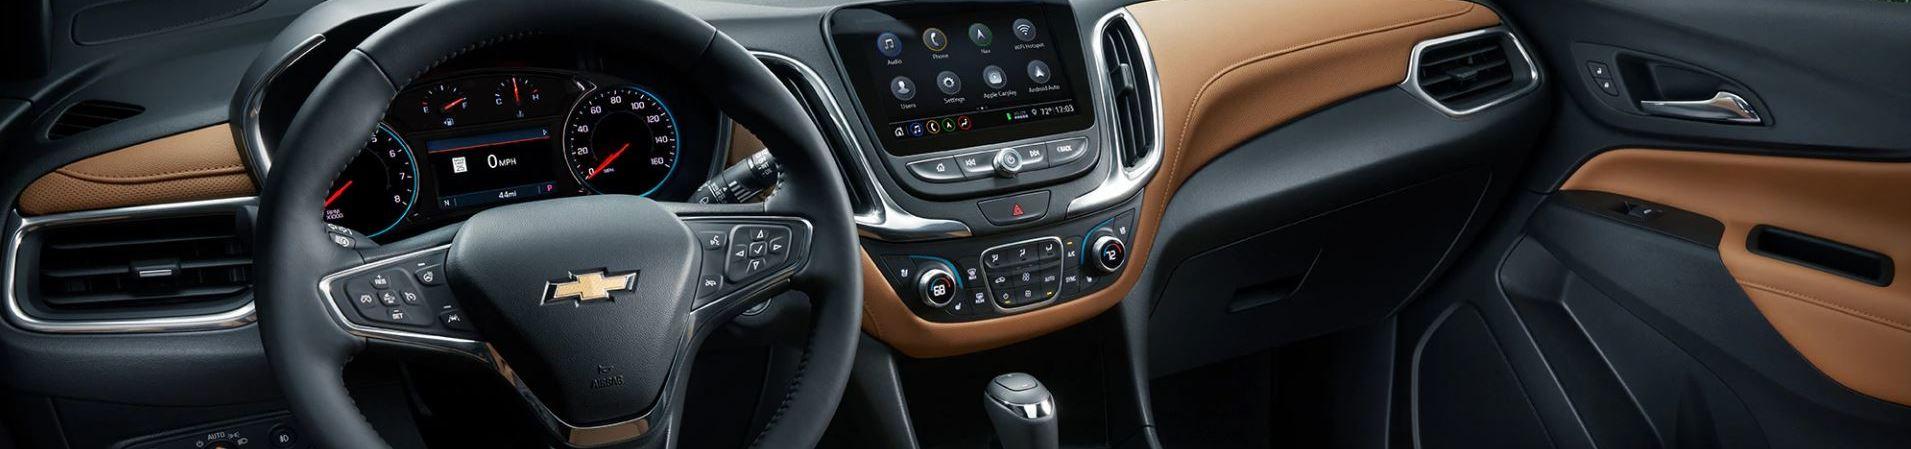 2020 Chevrolet Equinox Dashboard